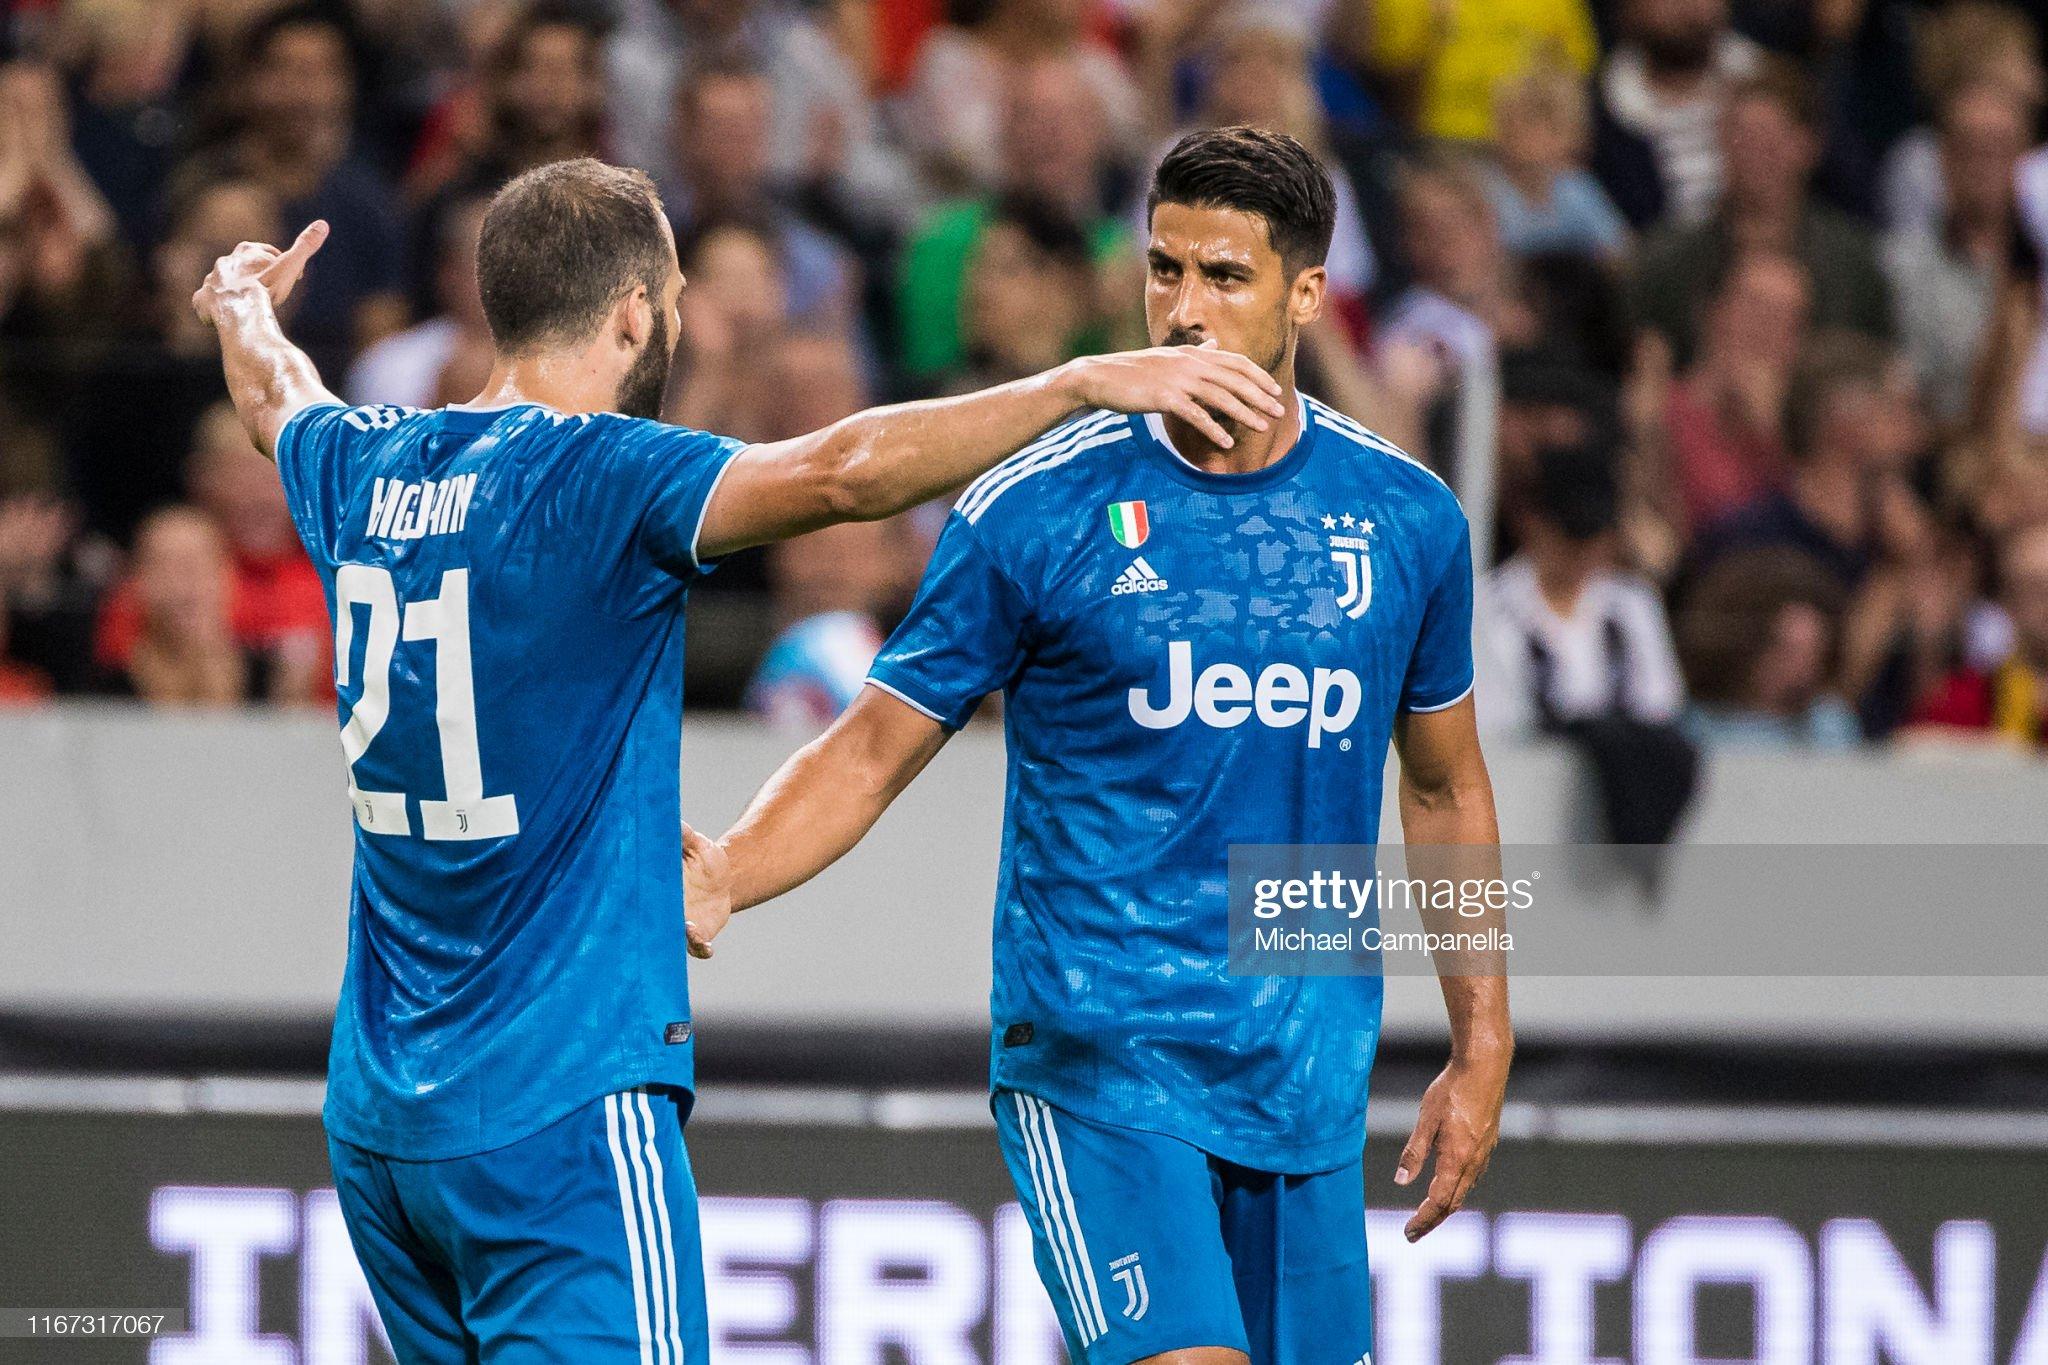 Atletico de Madrid v Juventus - 2019 International Champions Cup : News Photo